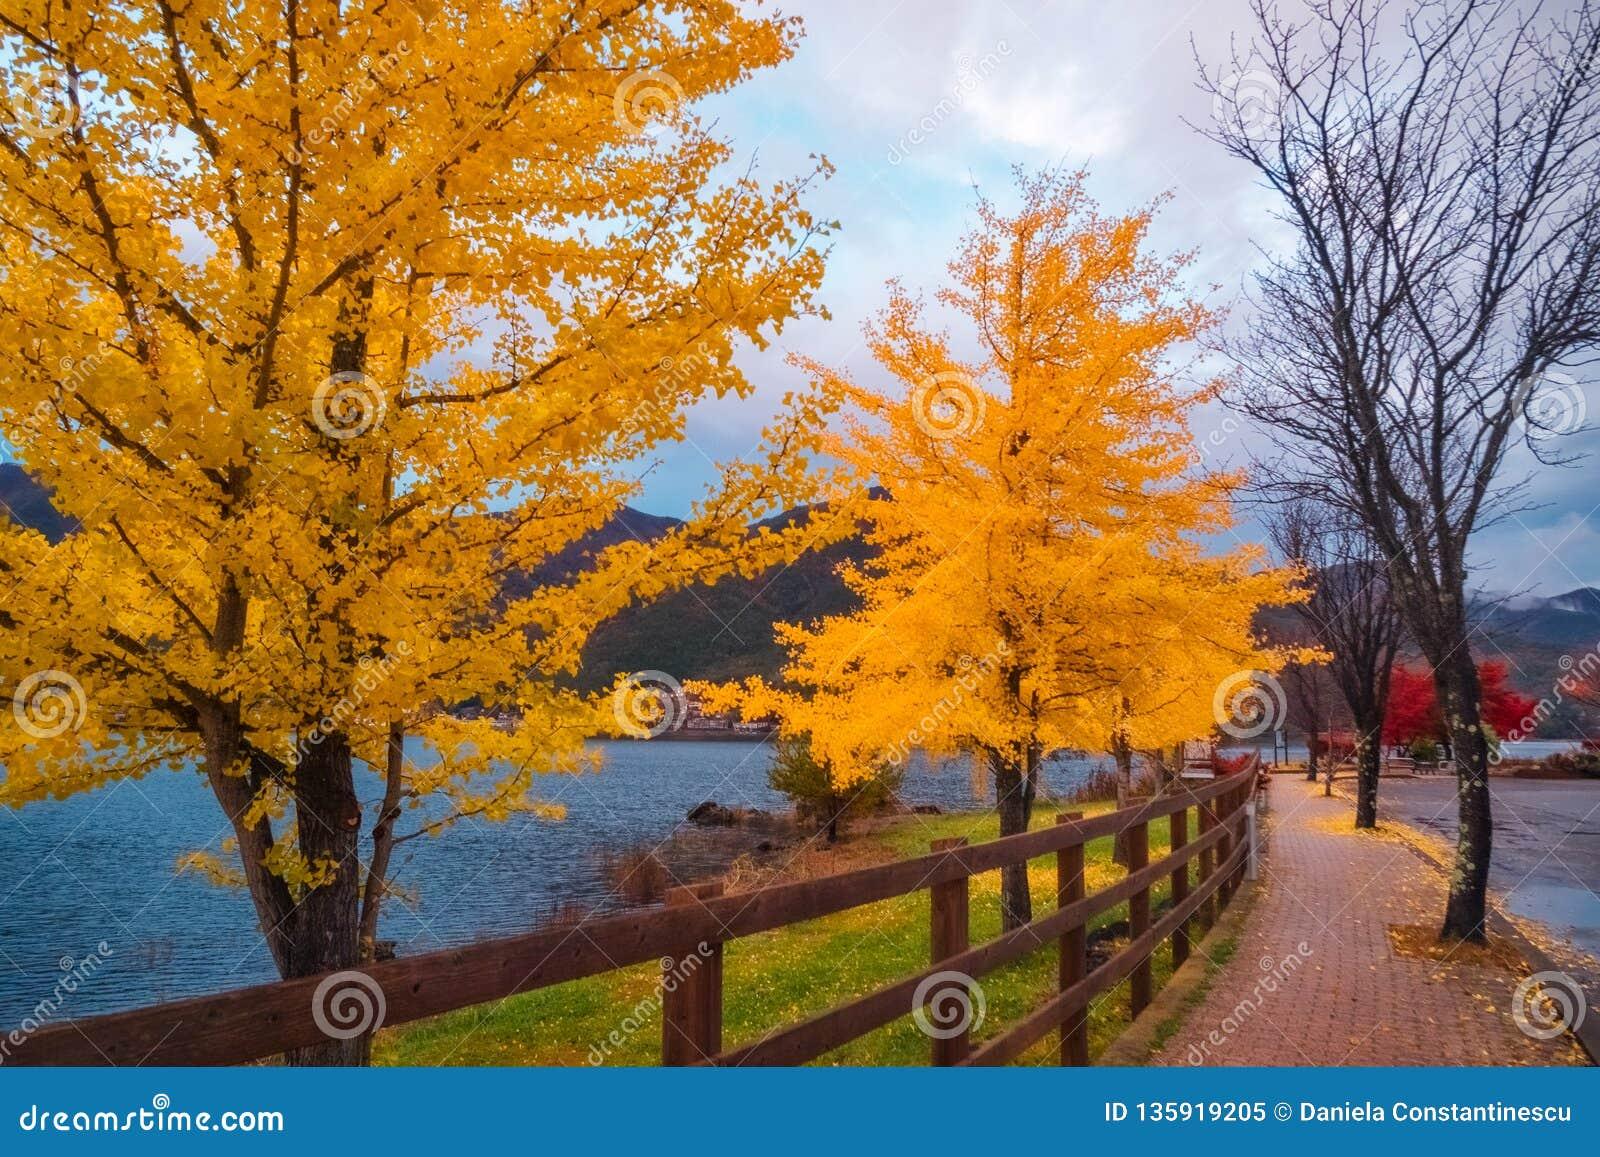 Yellow trees in autumn on a street in Fujikawaguchiko, Japan